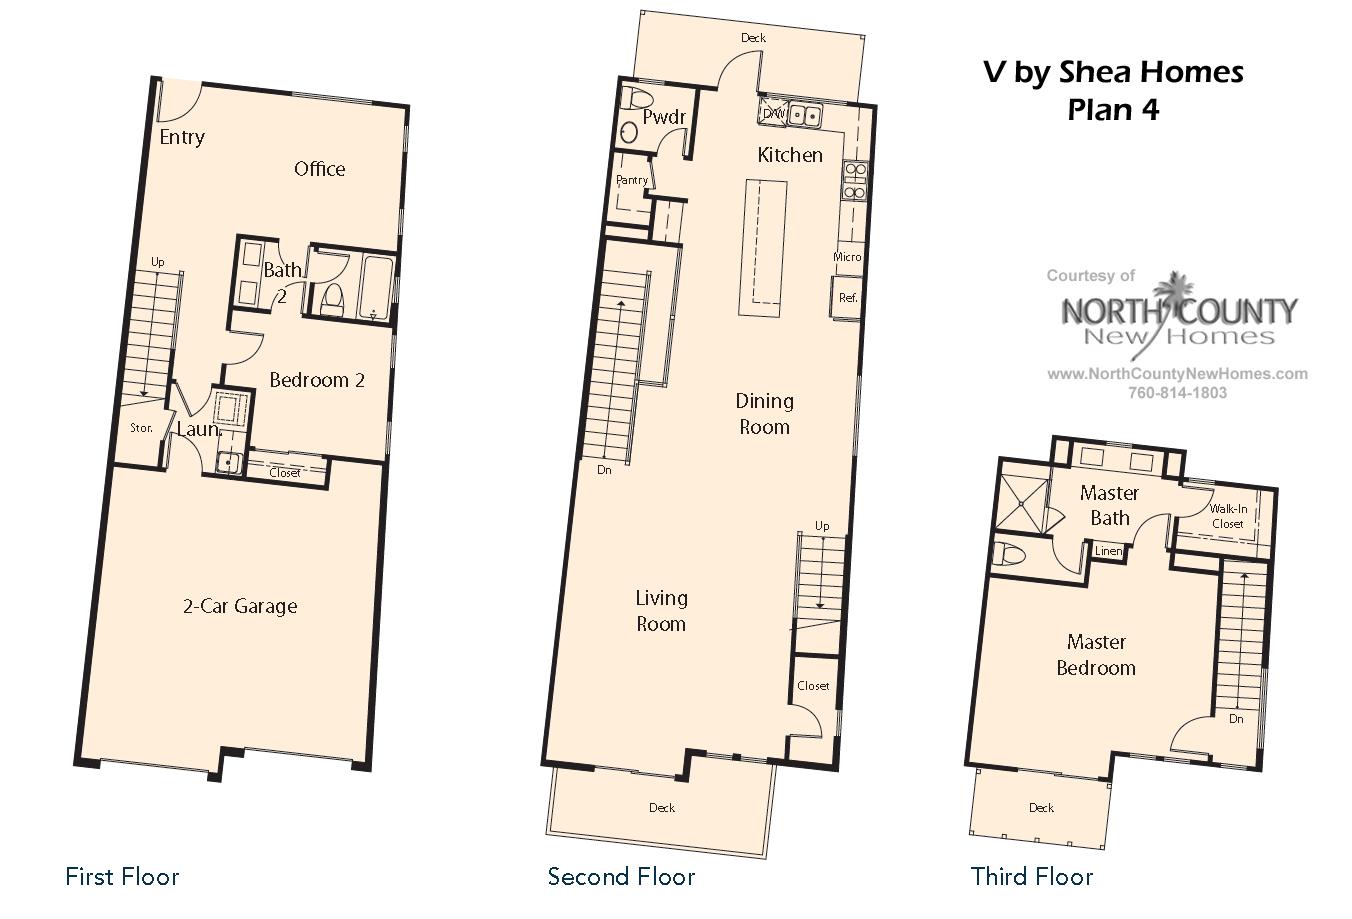 V by Shea Homes in Leucadia - Floor Plan 4 - North County ... Shea Homes Floor Plans Bed Bath on 3 bed 3 bath floor plans, 5 bed 3 bath floor plans, 6 bed 3 bath floor plans, 2 bed 1 bath floor plans, bathroom floor plans, 4 bedroom home floor plans,